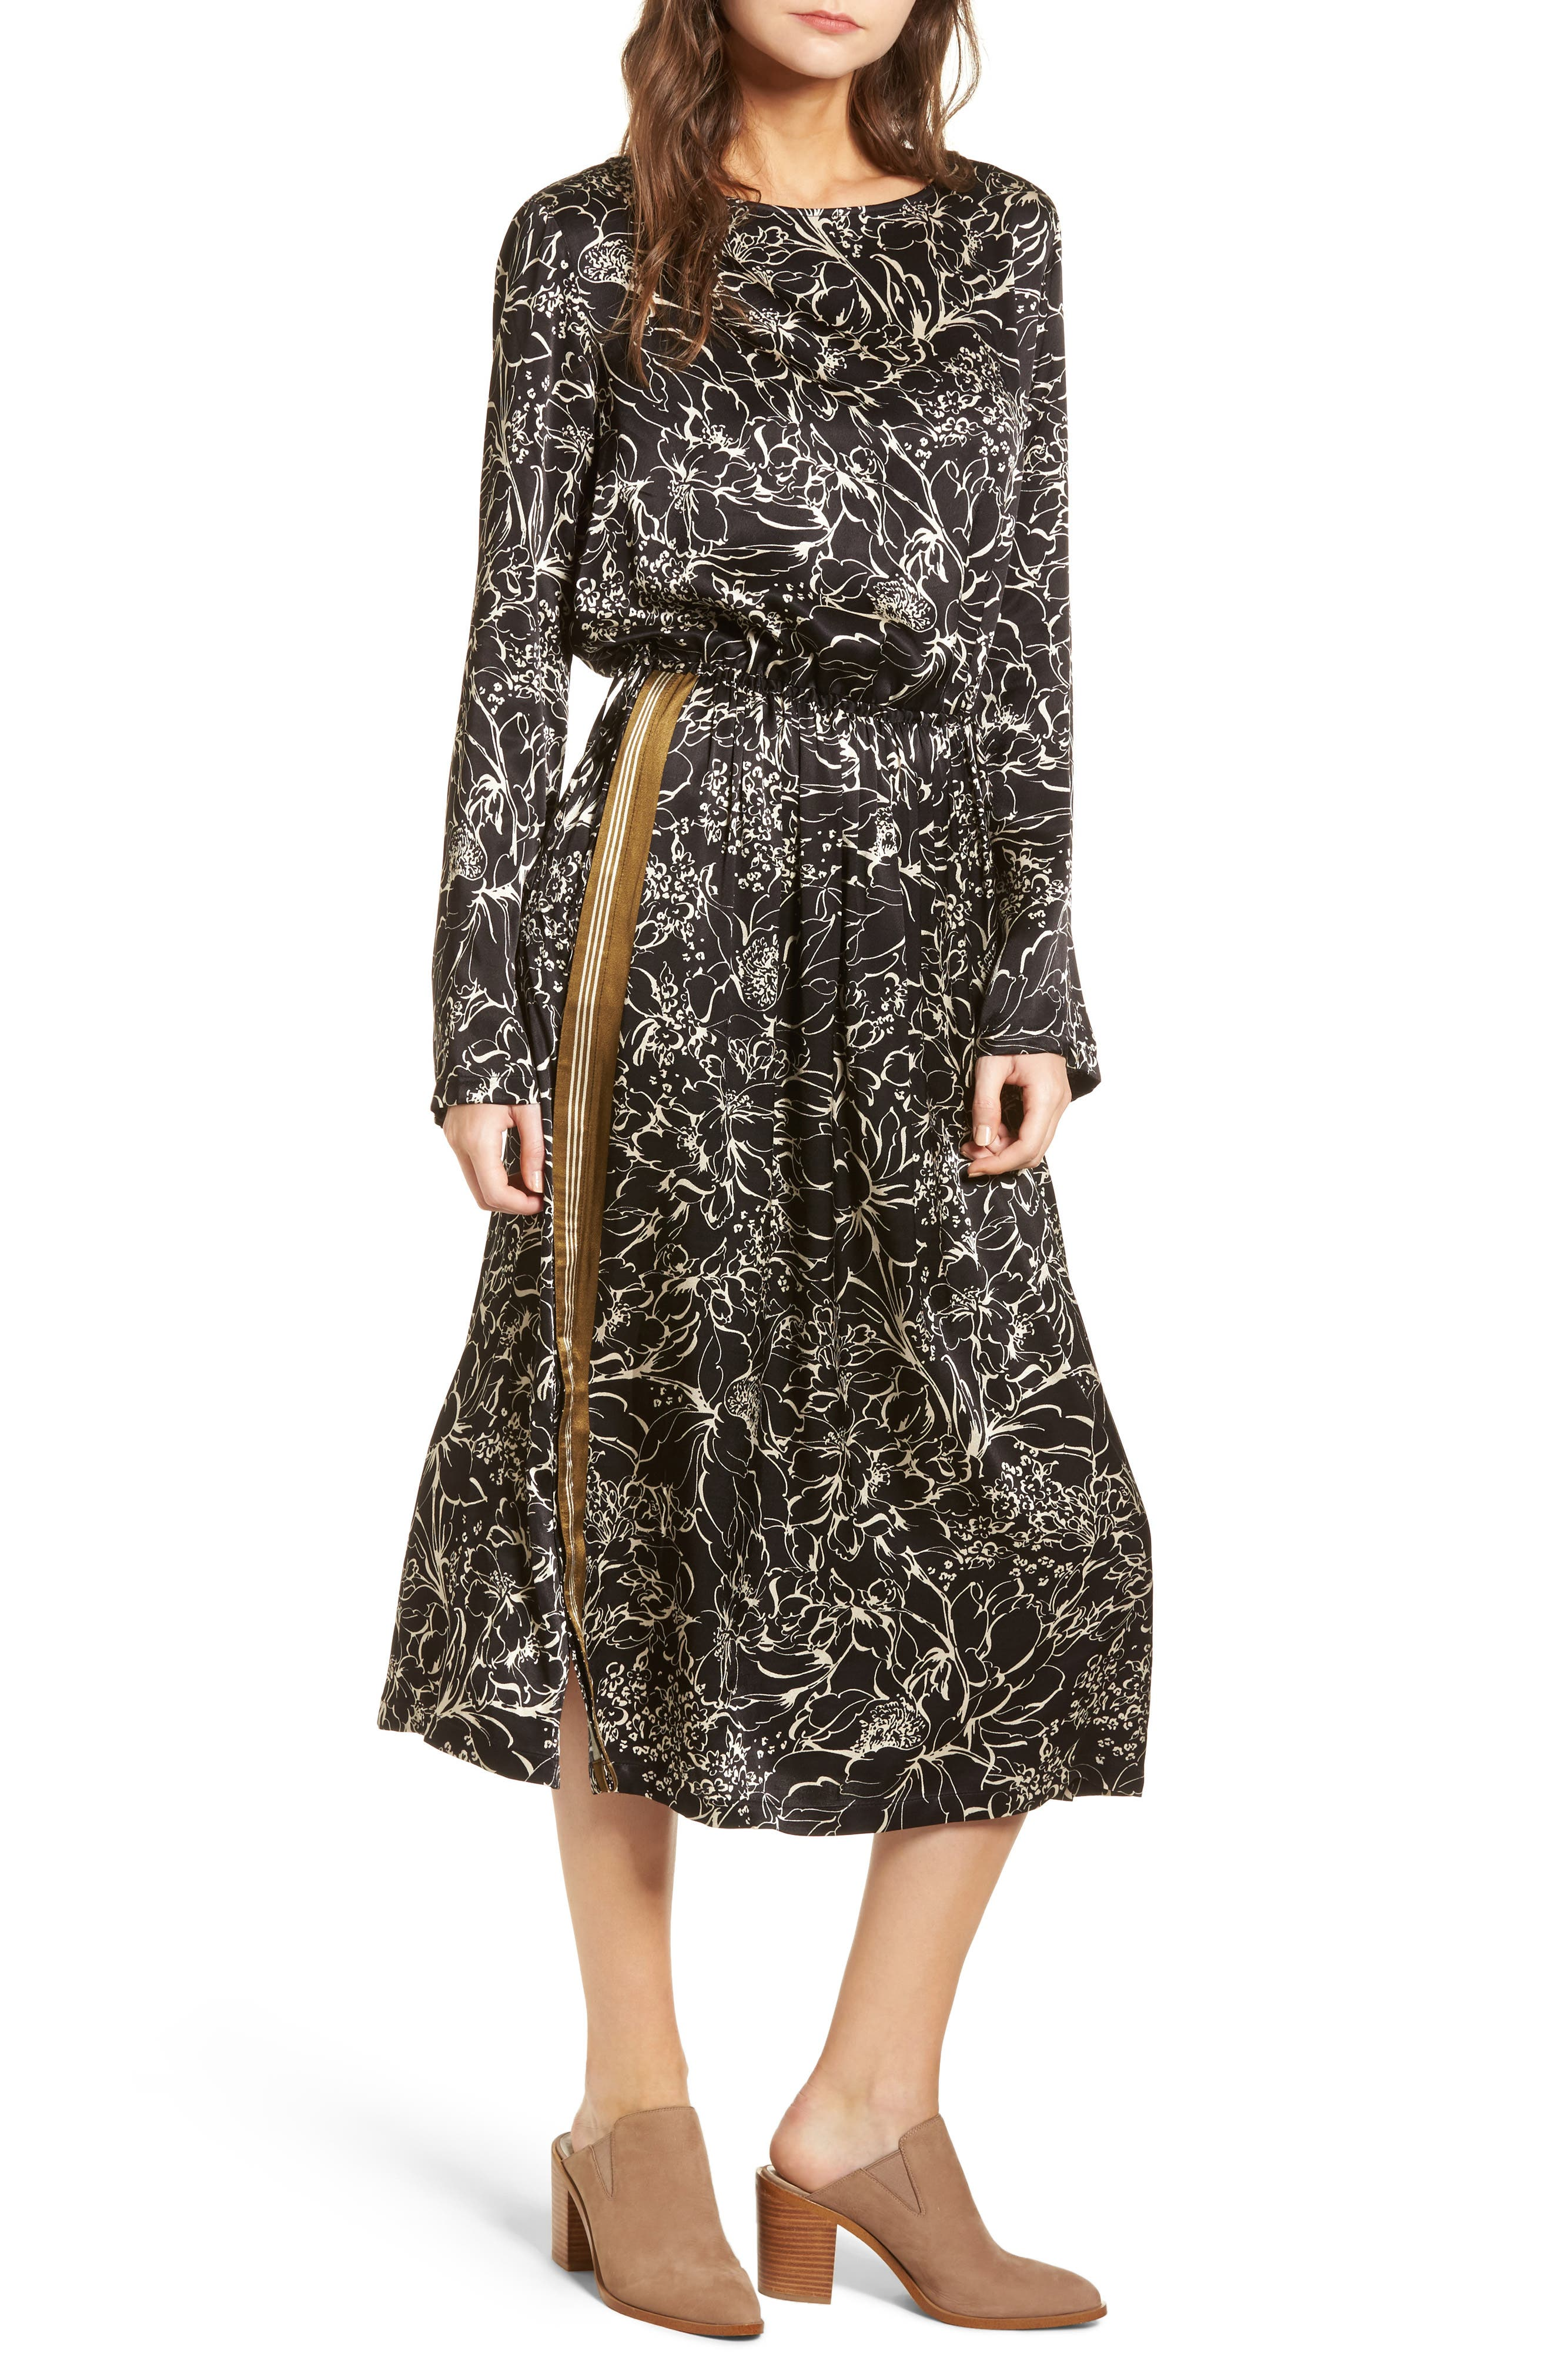 Main Image - Treasure & Bond Blouson Print Dress